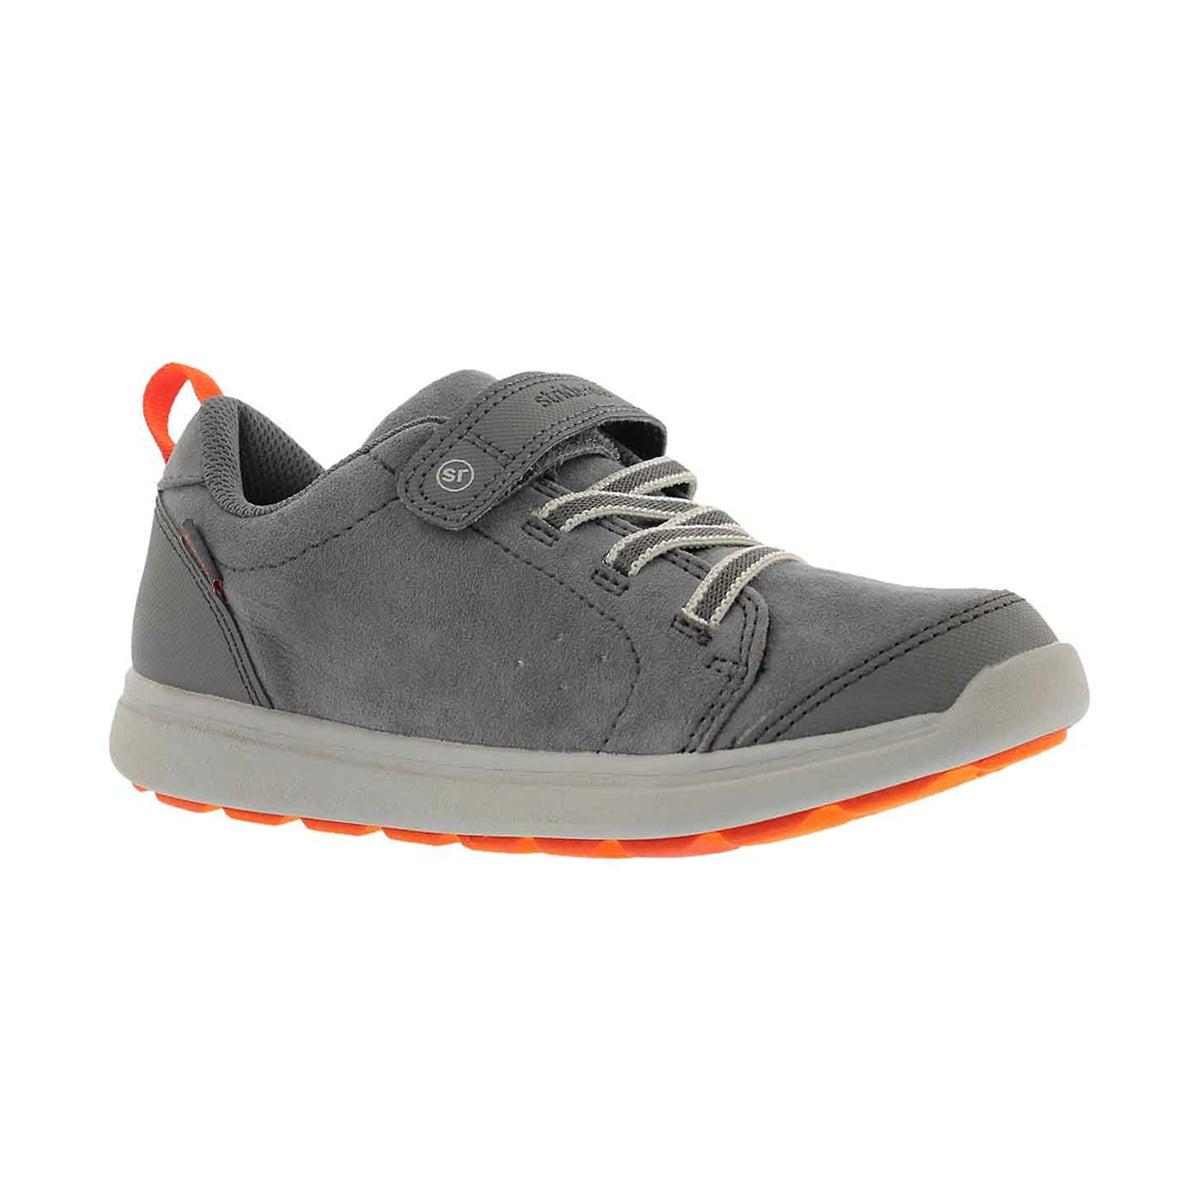 Boys' M2P BONDE grey sneakers